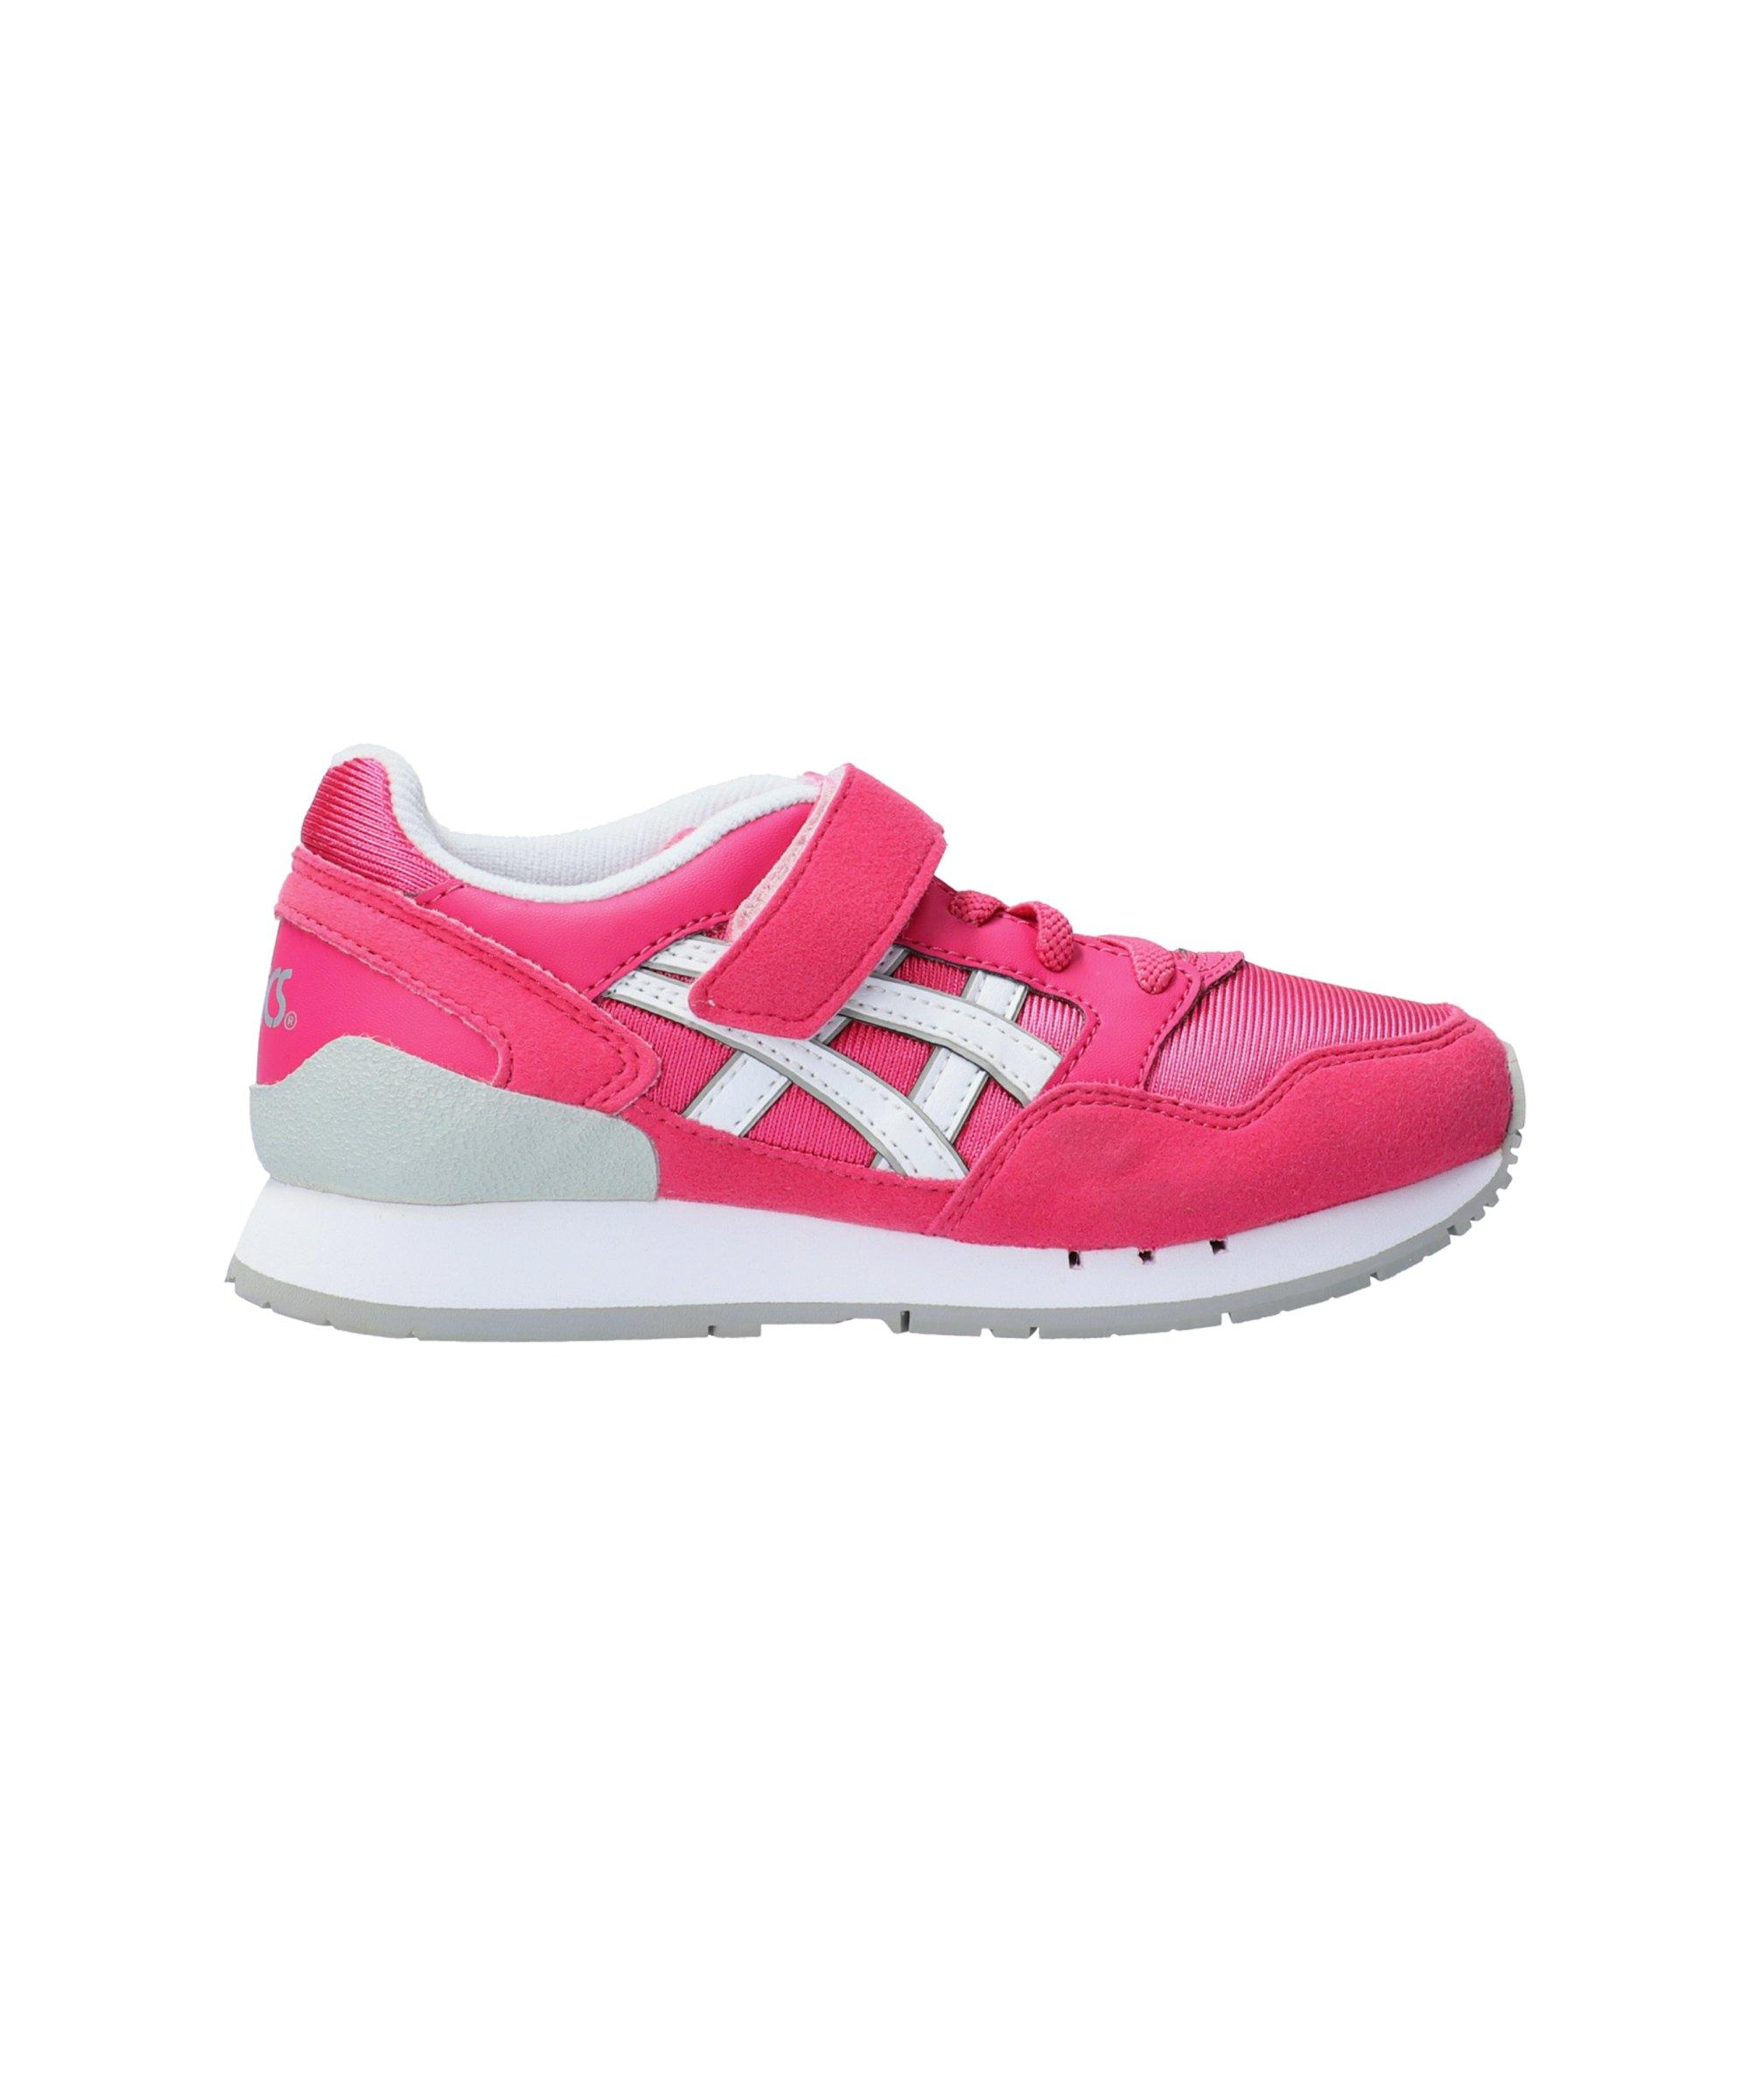 Asics Pre-Atlantis PS Sneaker Kids Pink F1901 - Pink